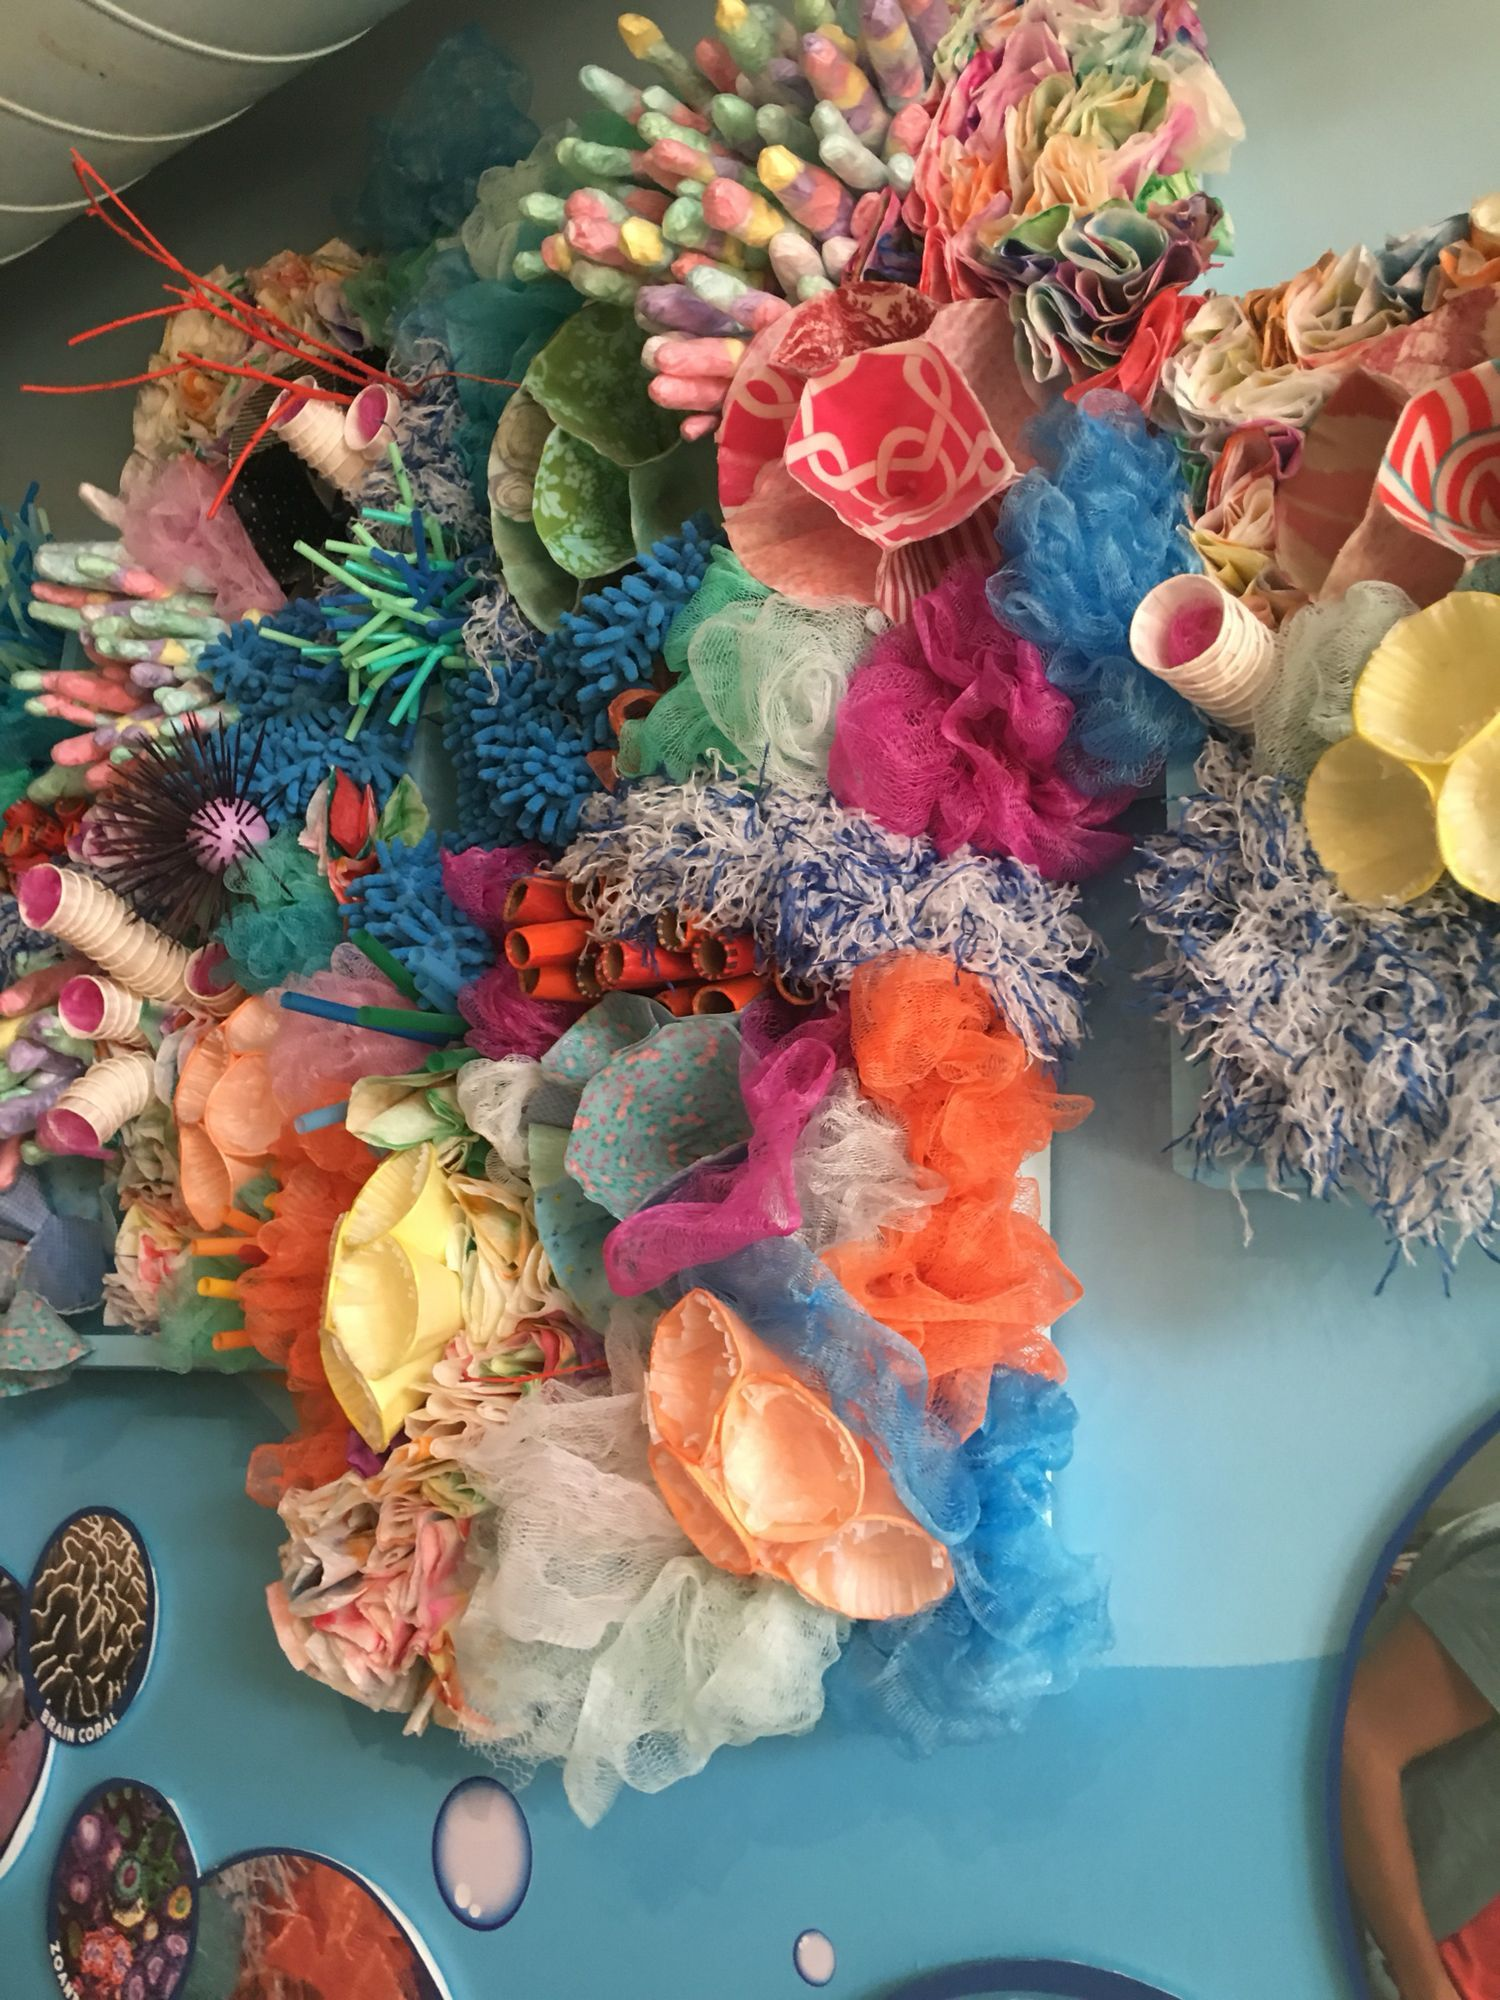 Diy Coral Reef Project Displayed At Marbles Kids Museum